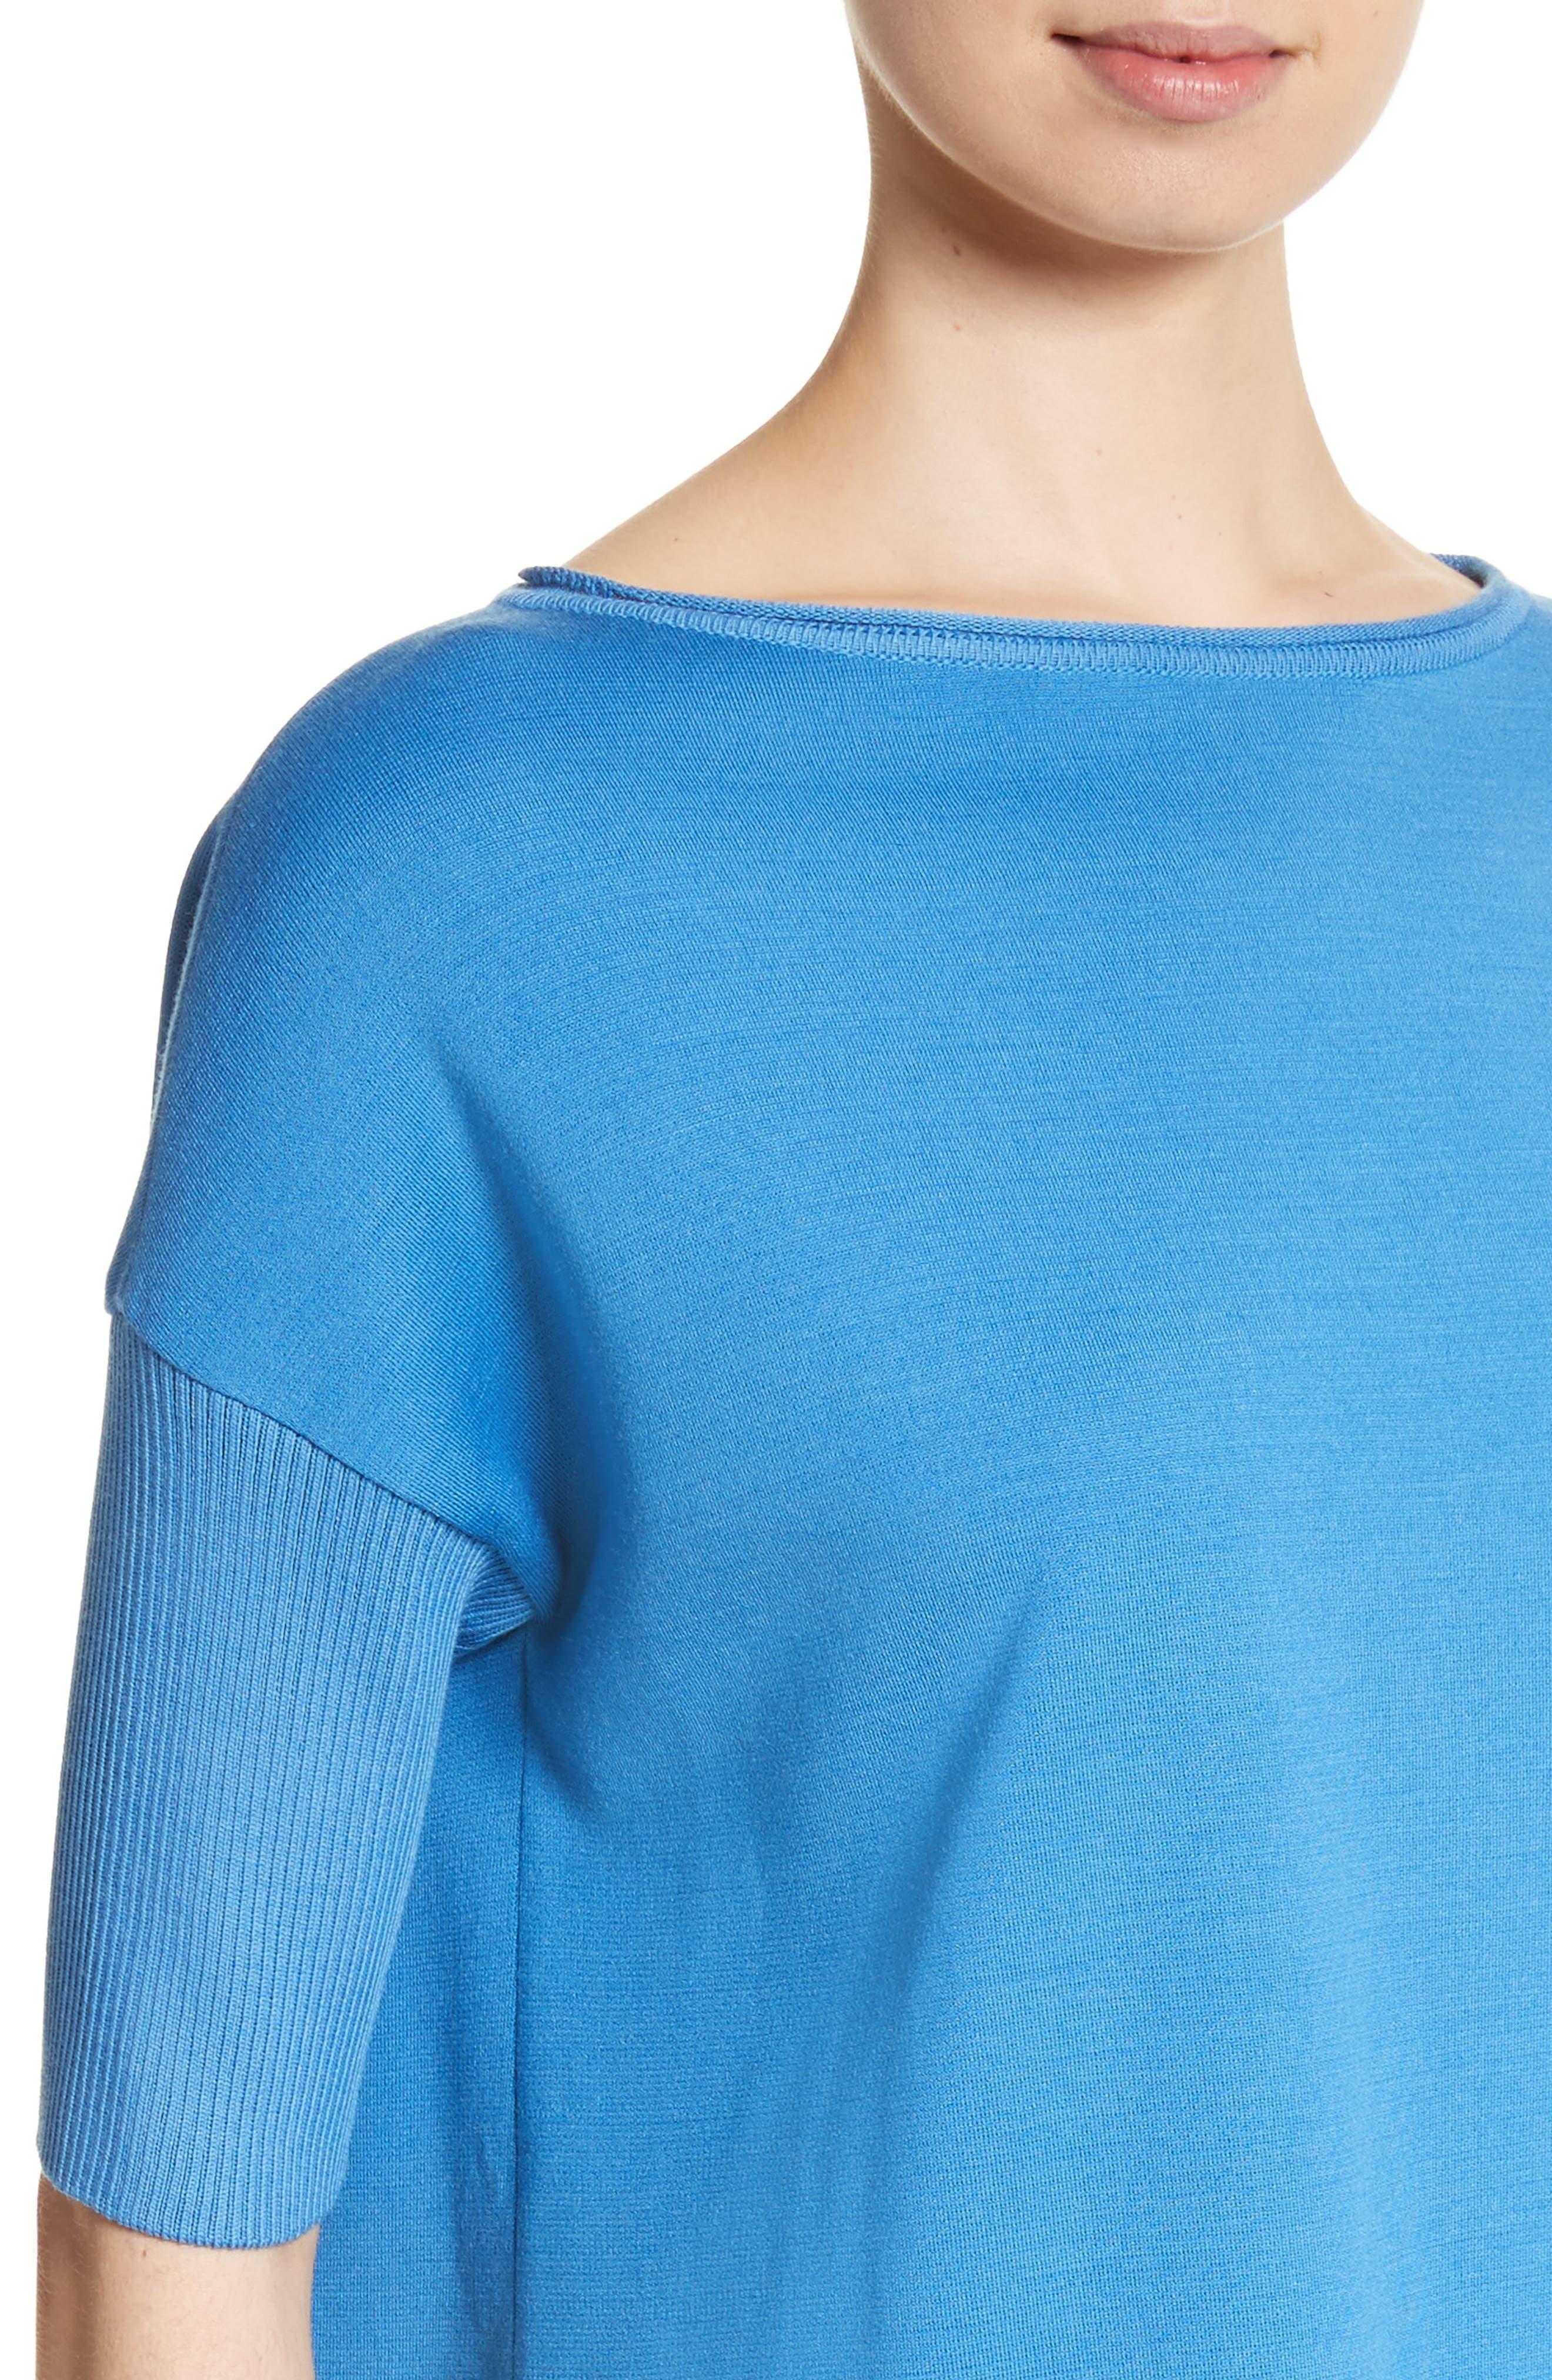 Milano Knit Tunic,                             Alternate thumbnail 4, color,                             420